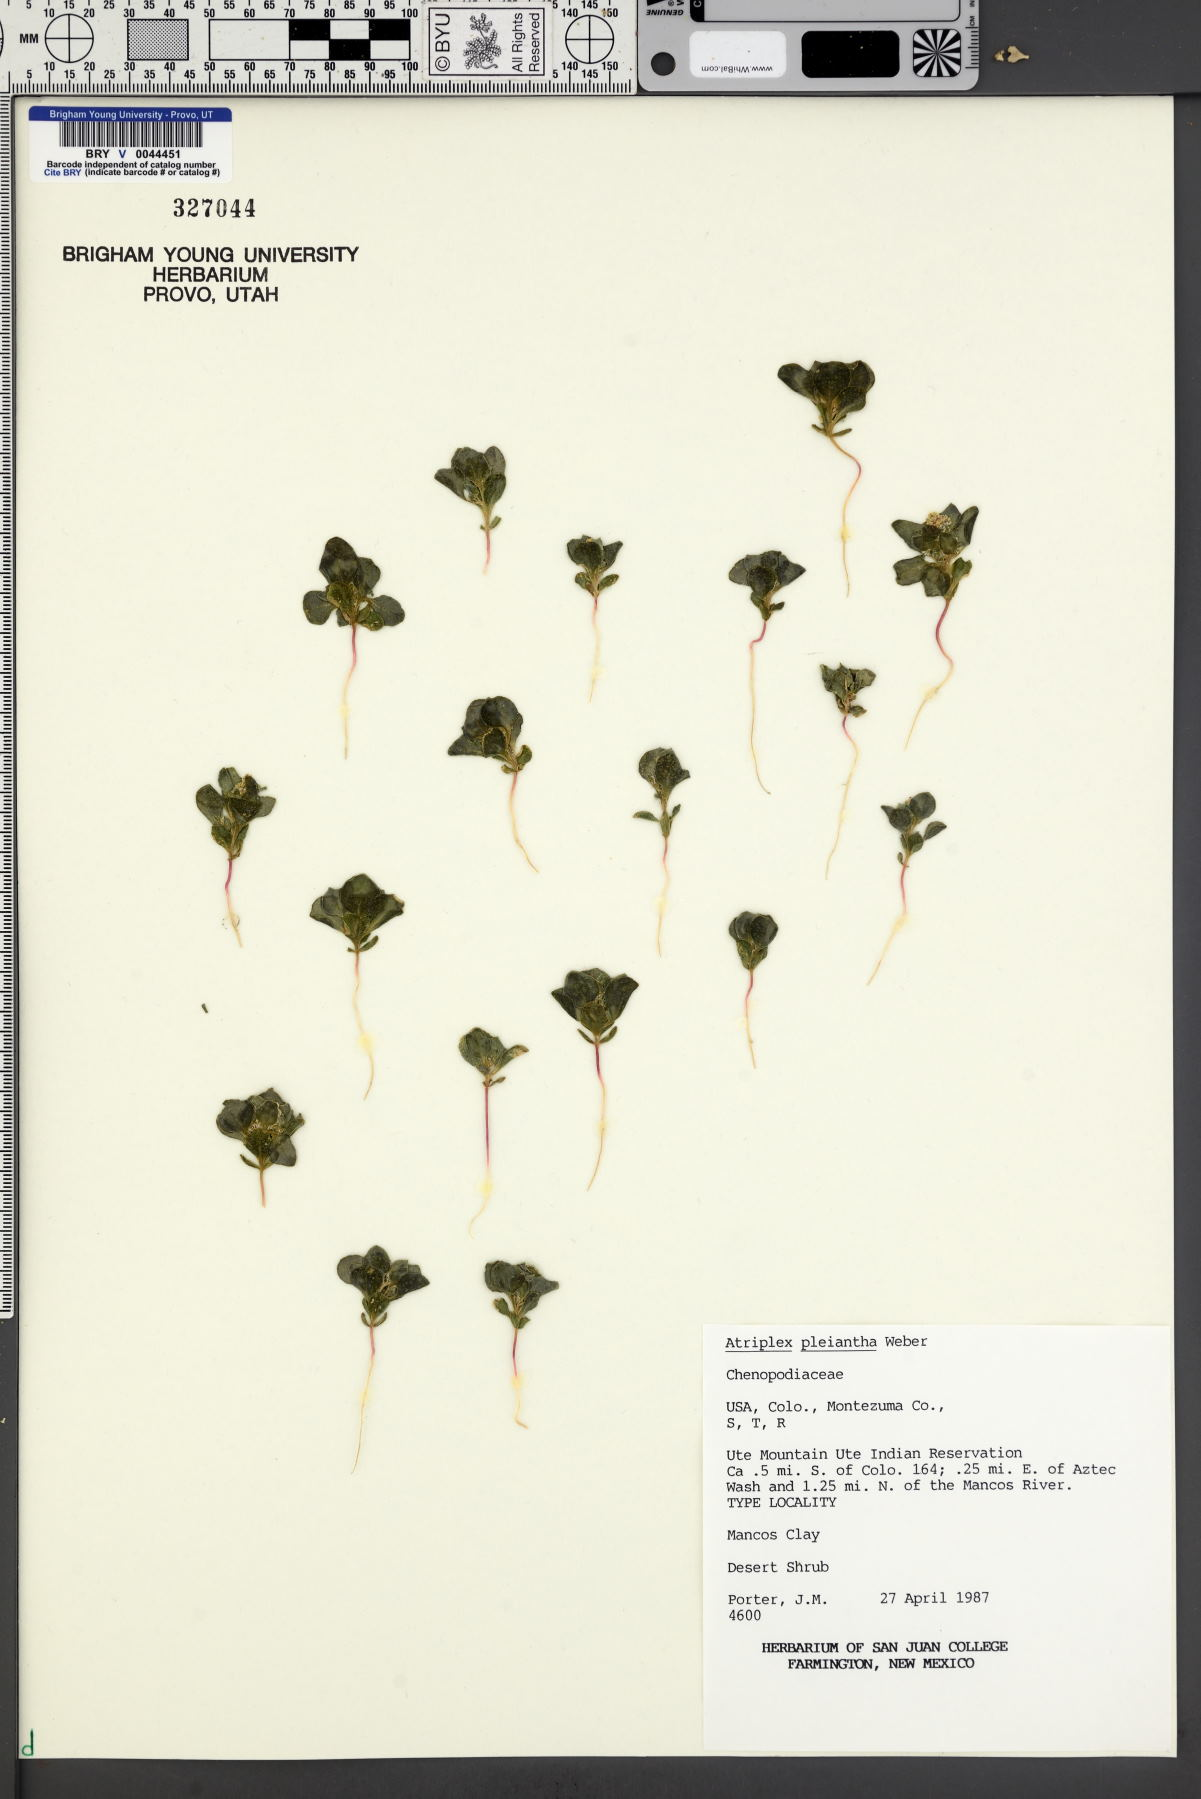 Atriplex pleiantha image